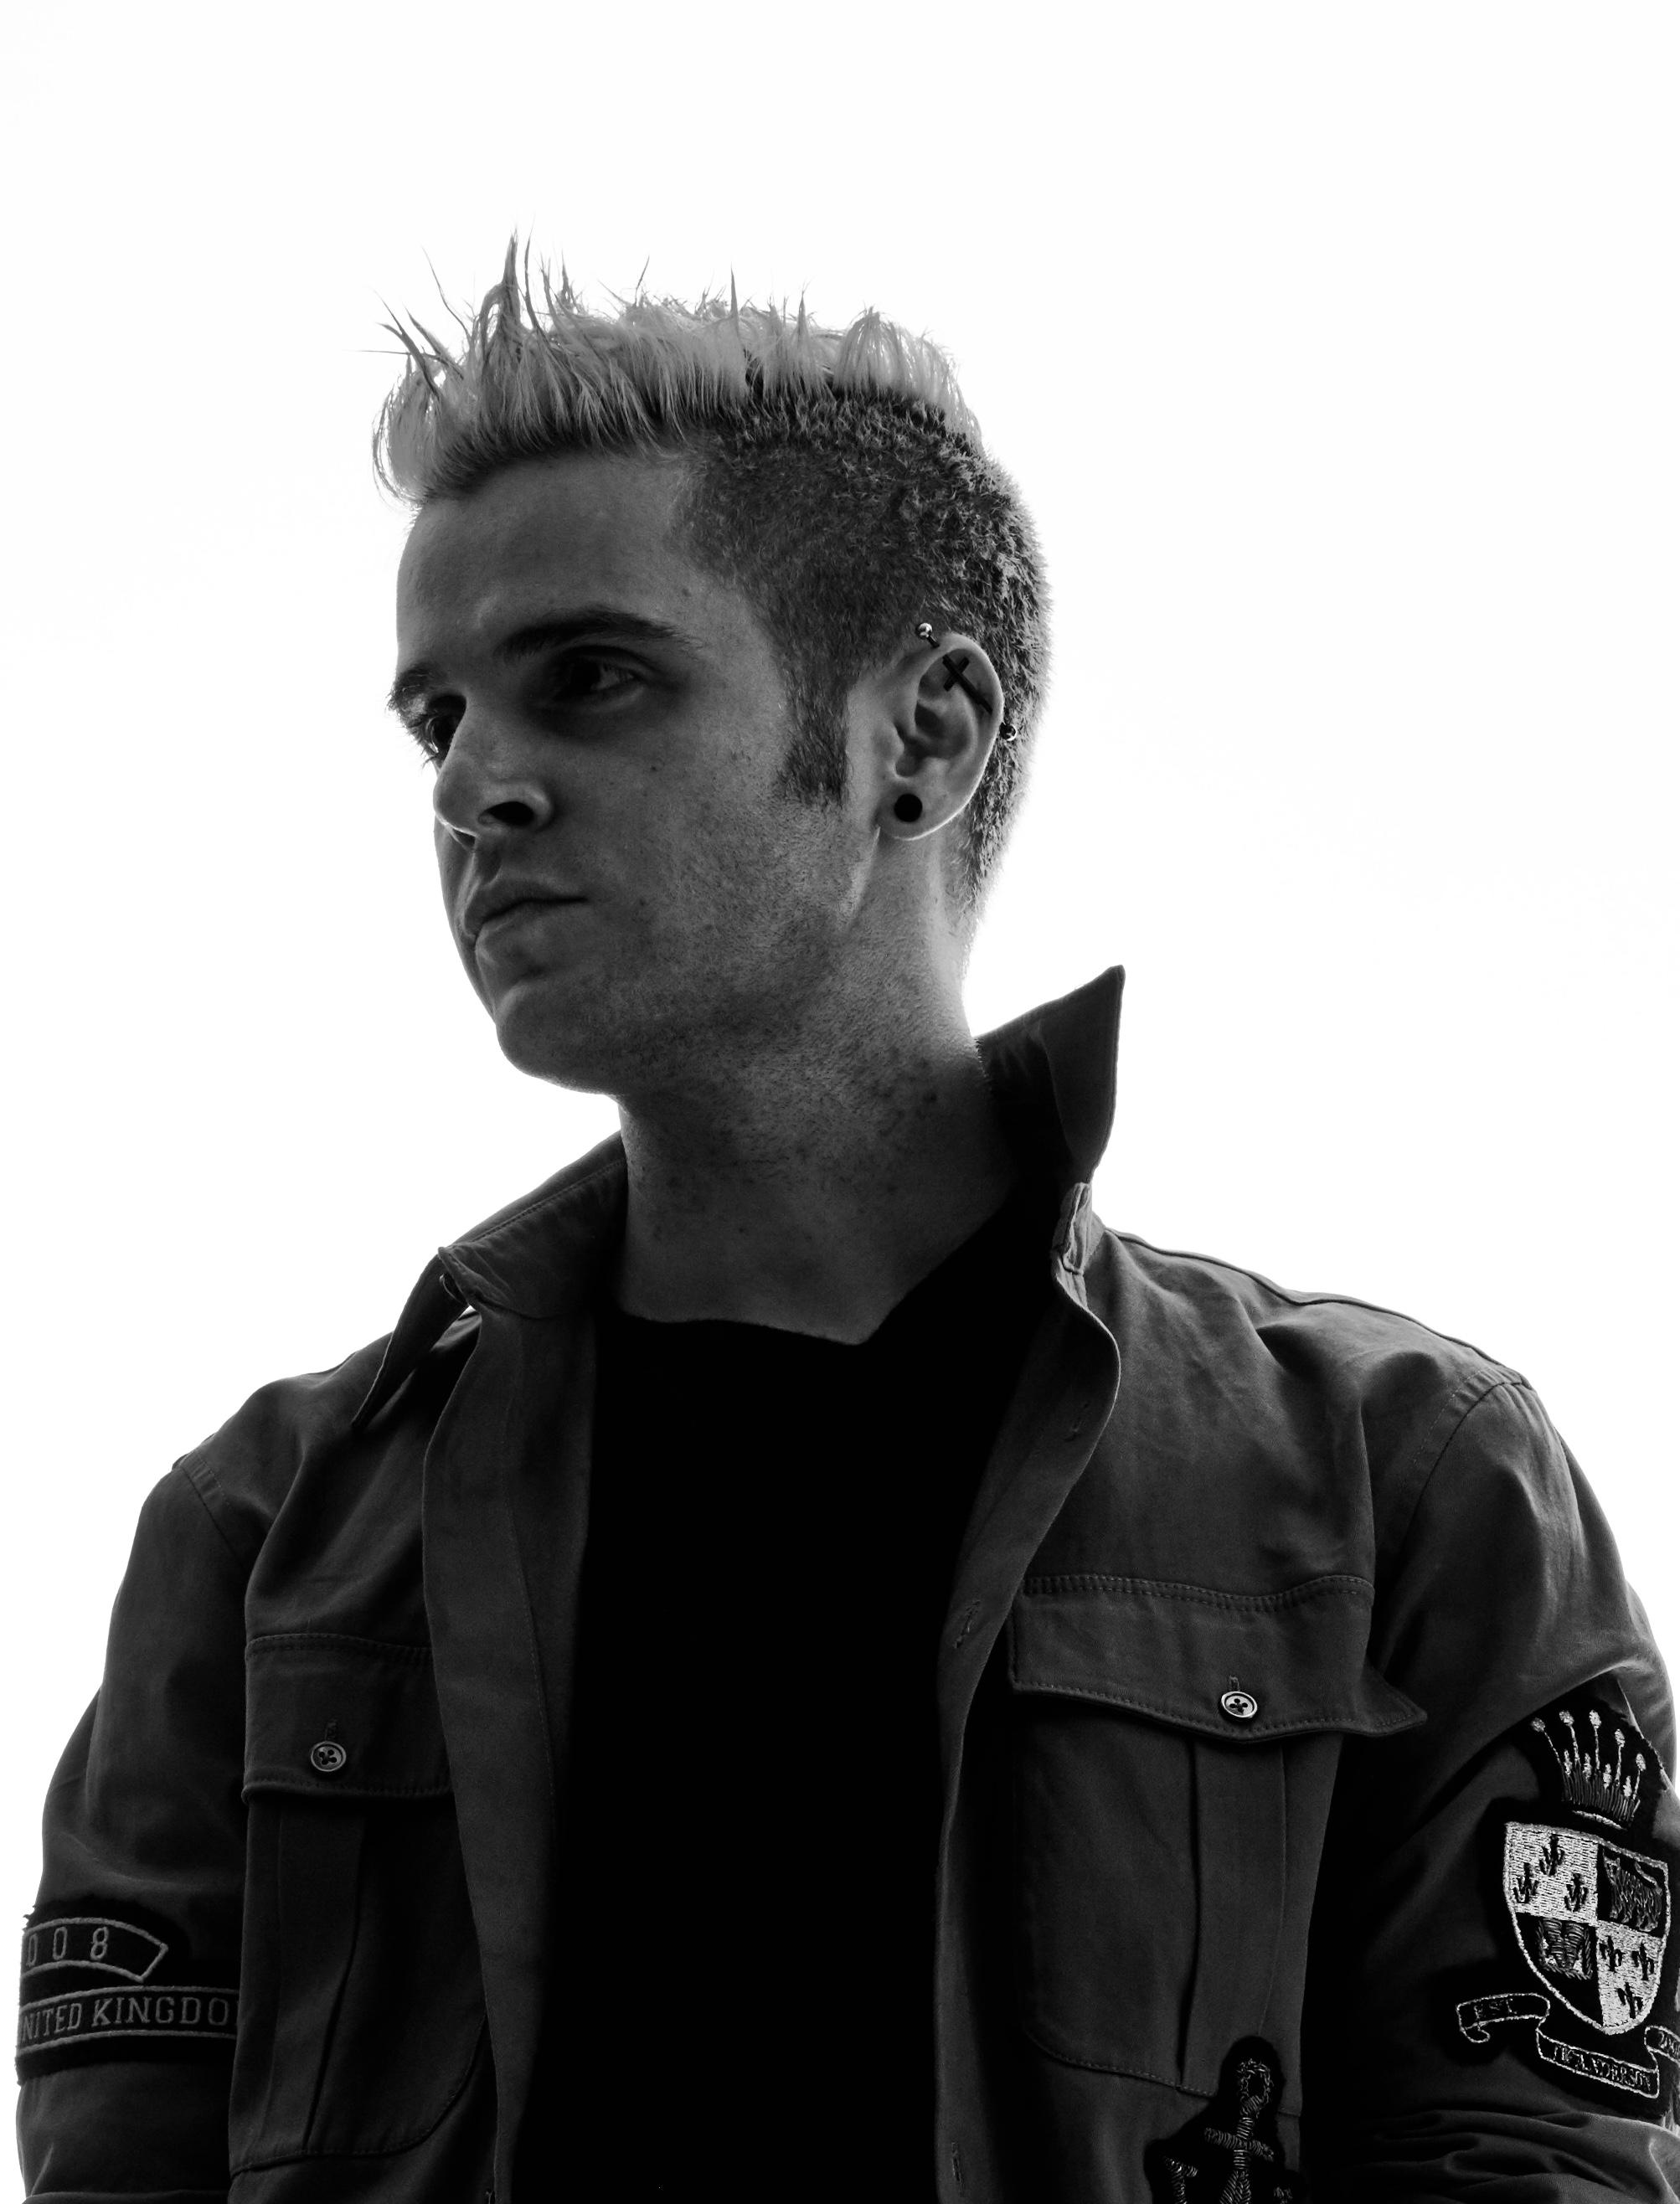 Ryan Petz